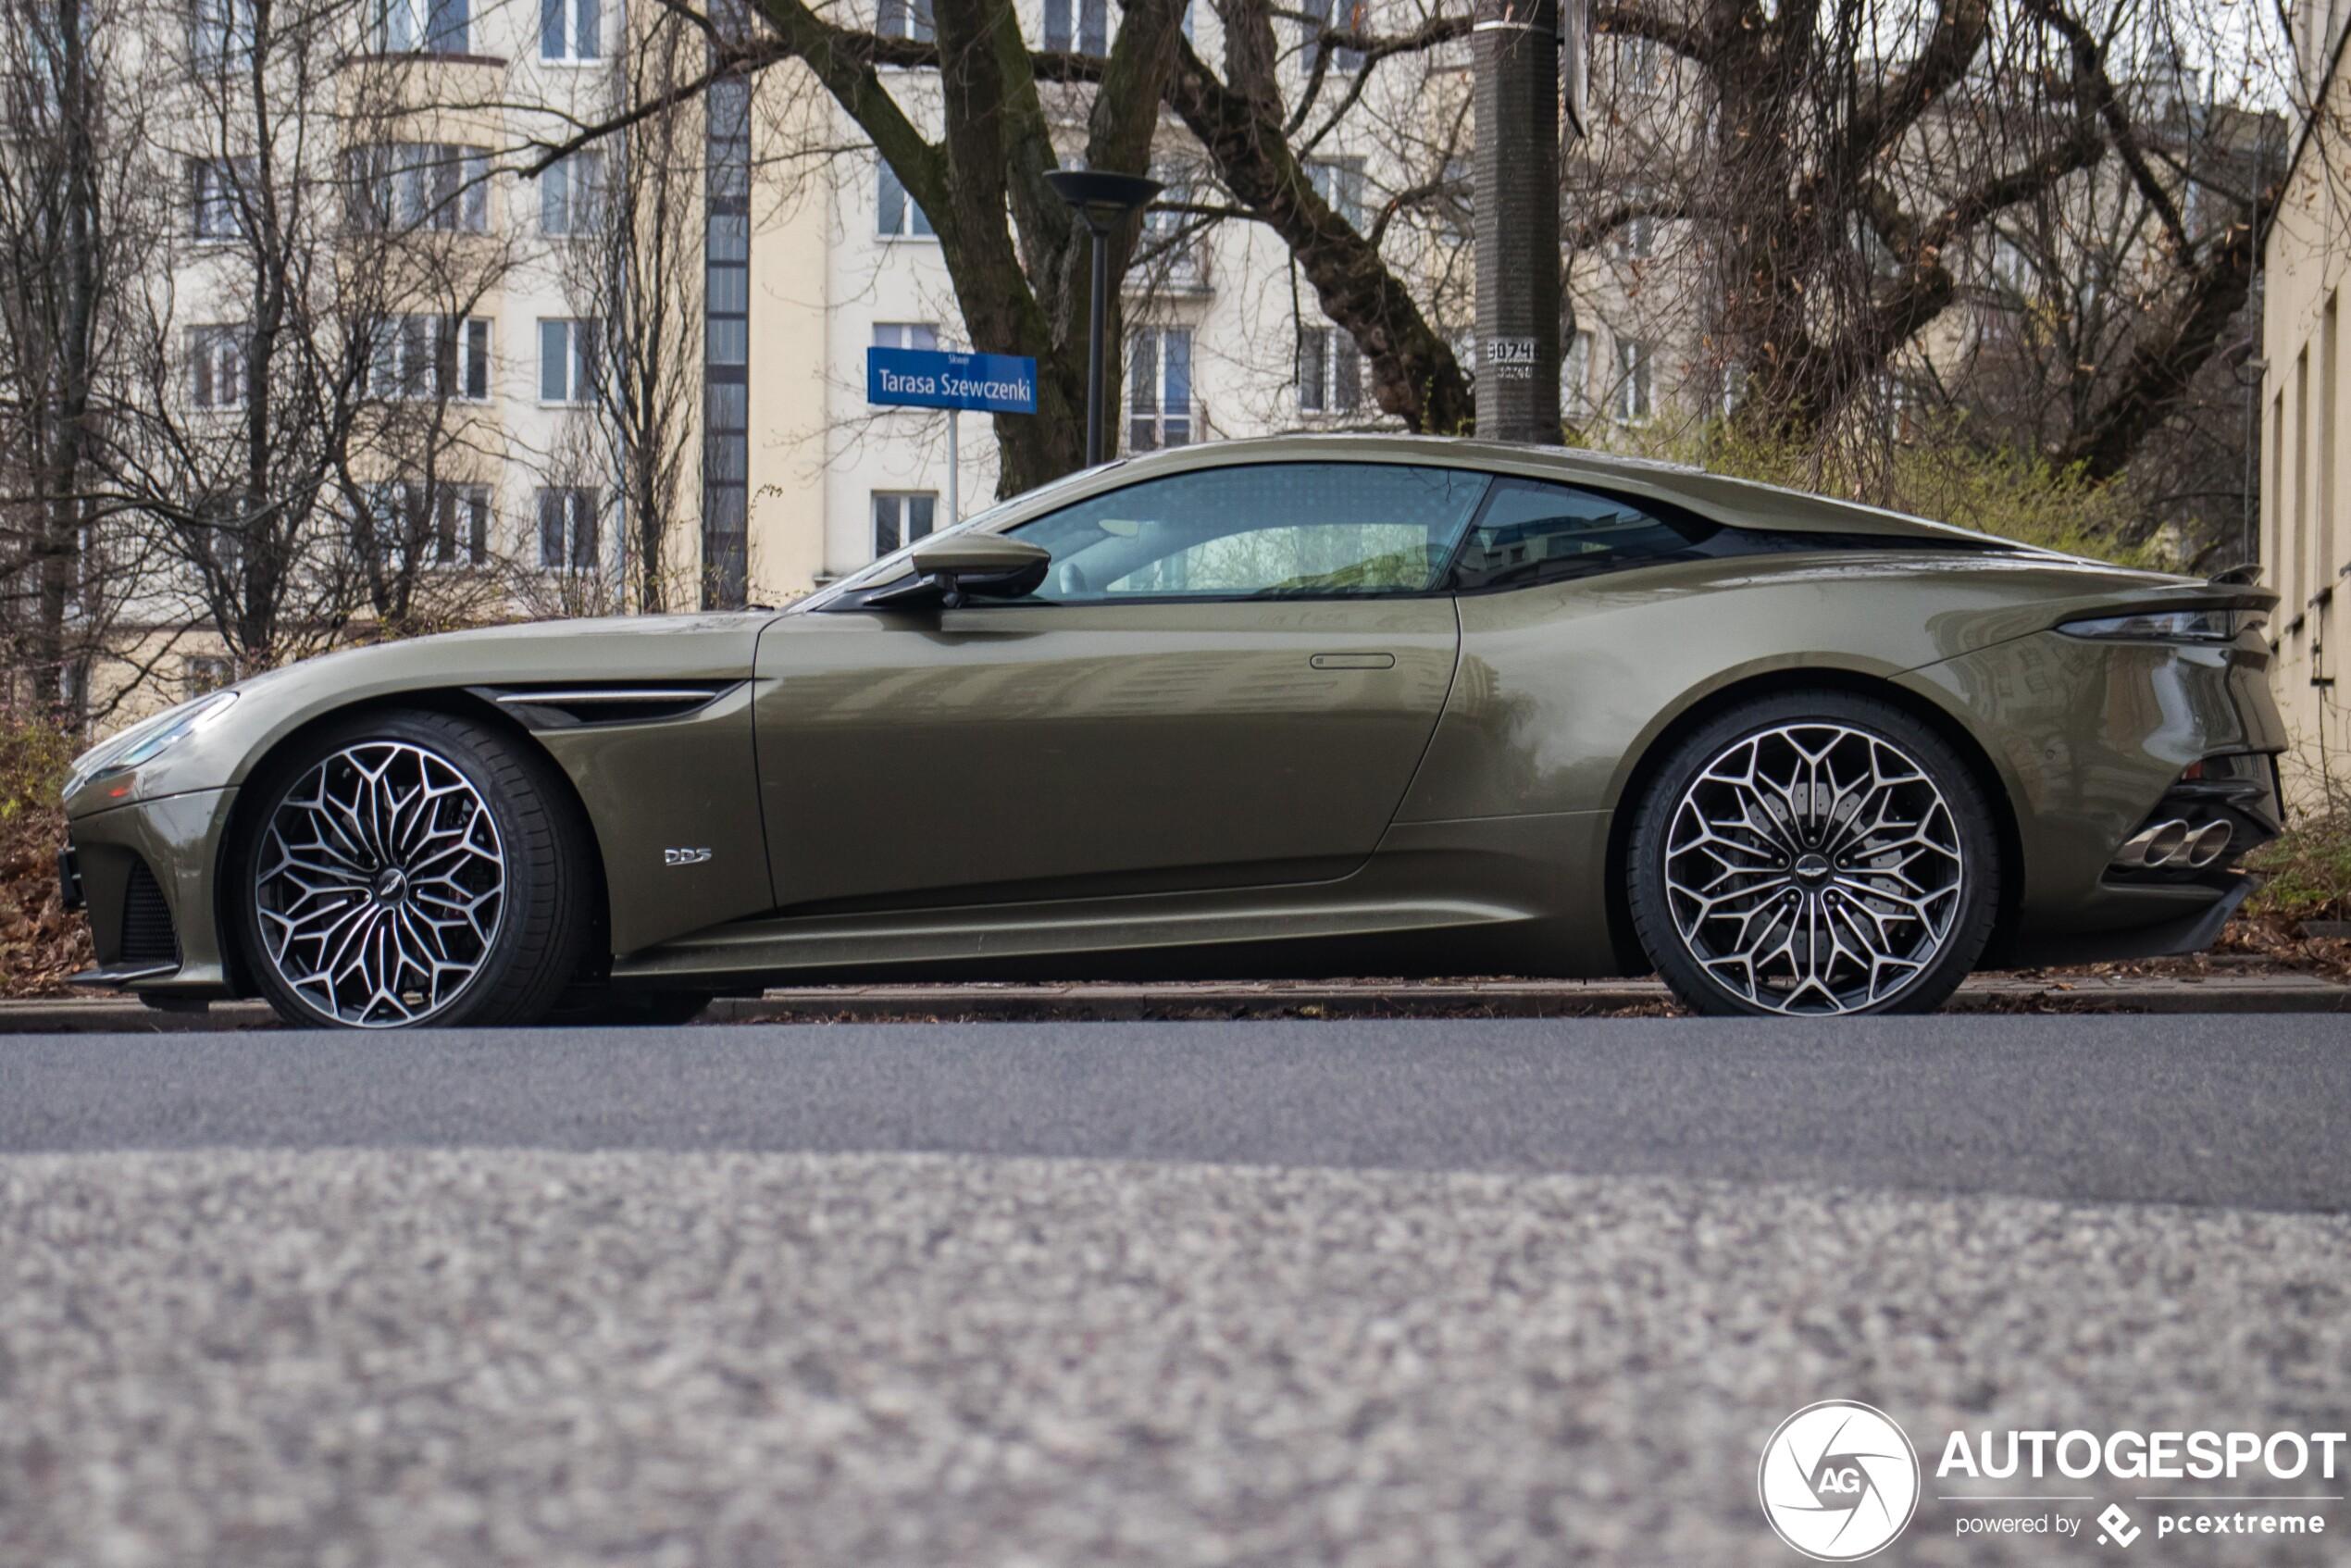 Aston Martin Dbs Superleggera Ohmss Edition 8 April 2020 Autogespot